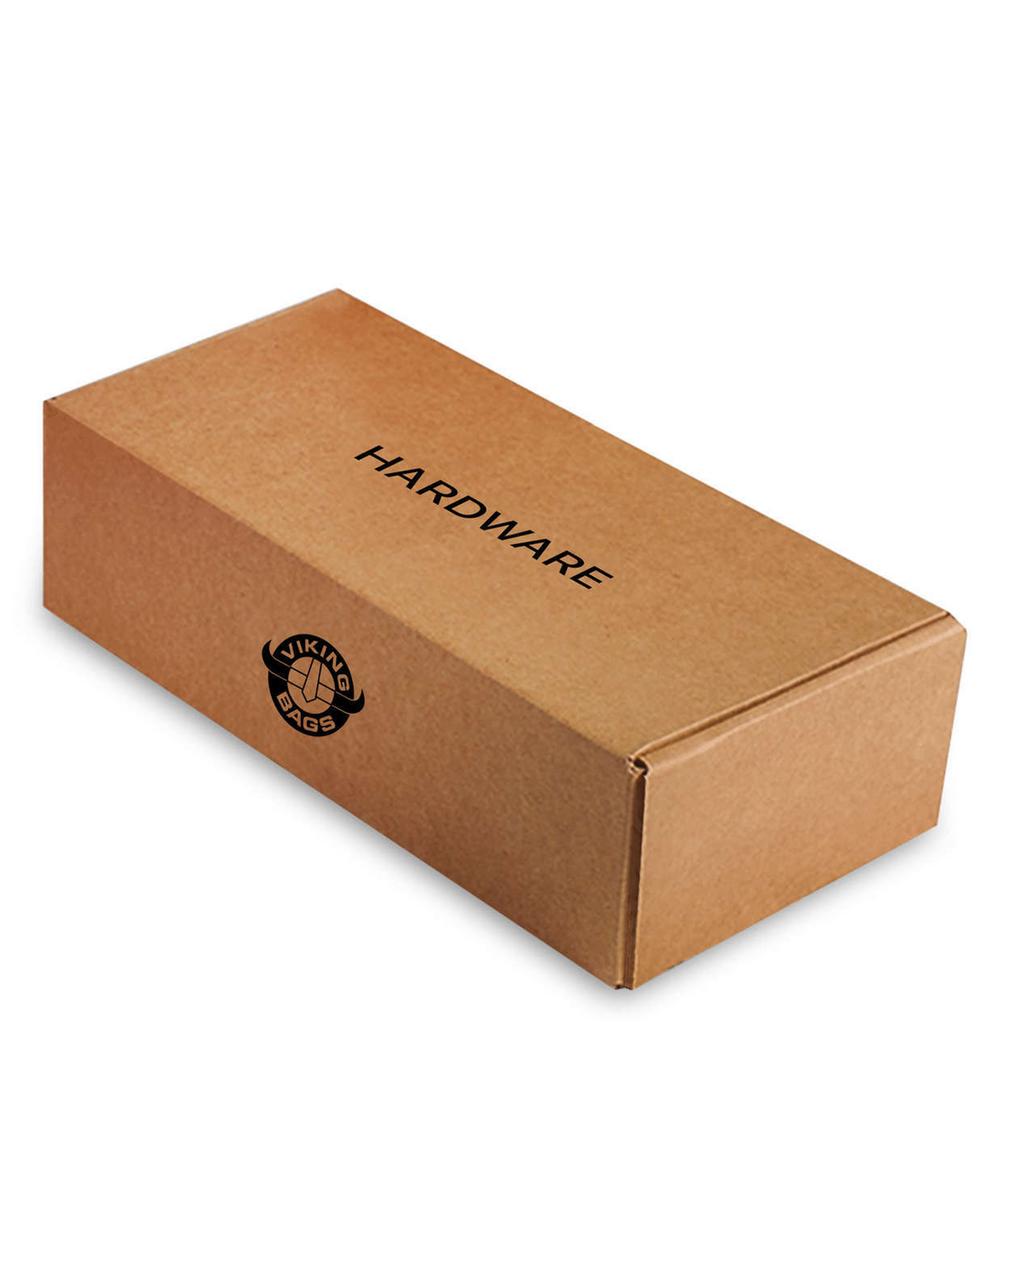 Viking Charger Single Strap Medium Motorcycle Saddlebags For Harley Softail Breakout Hardware Box